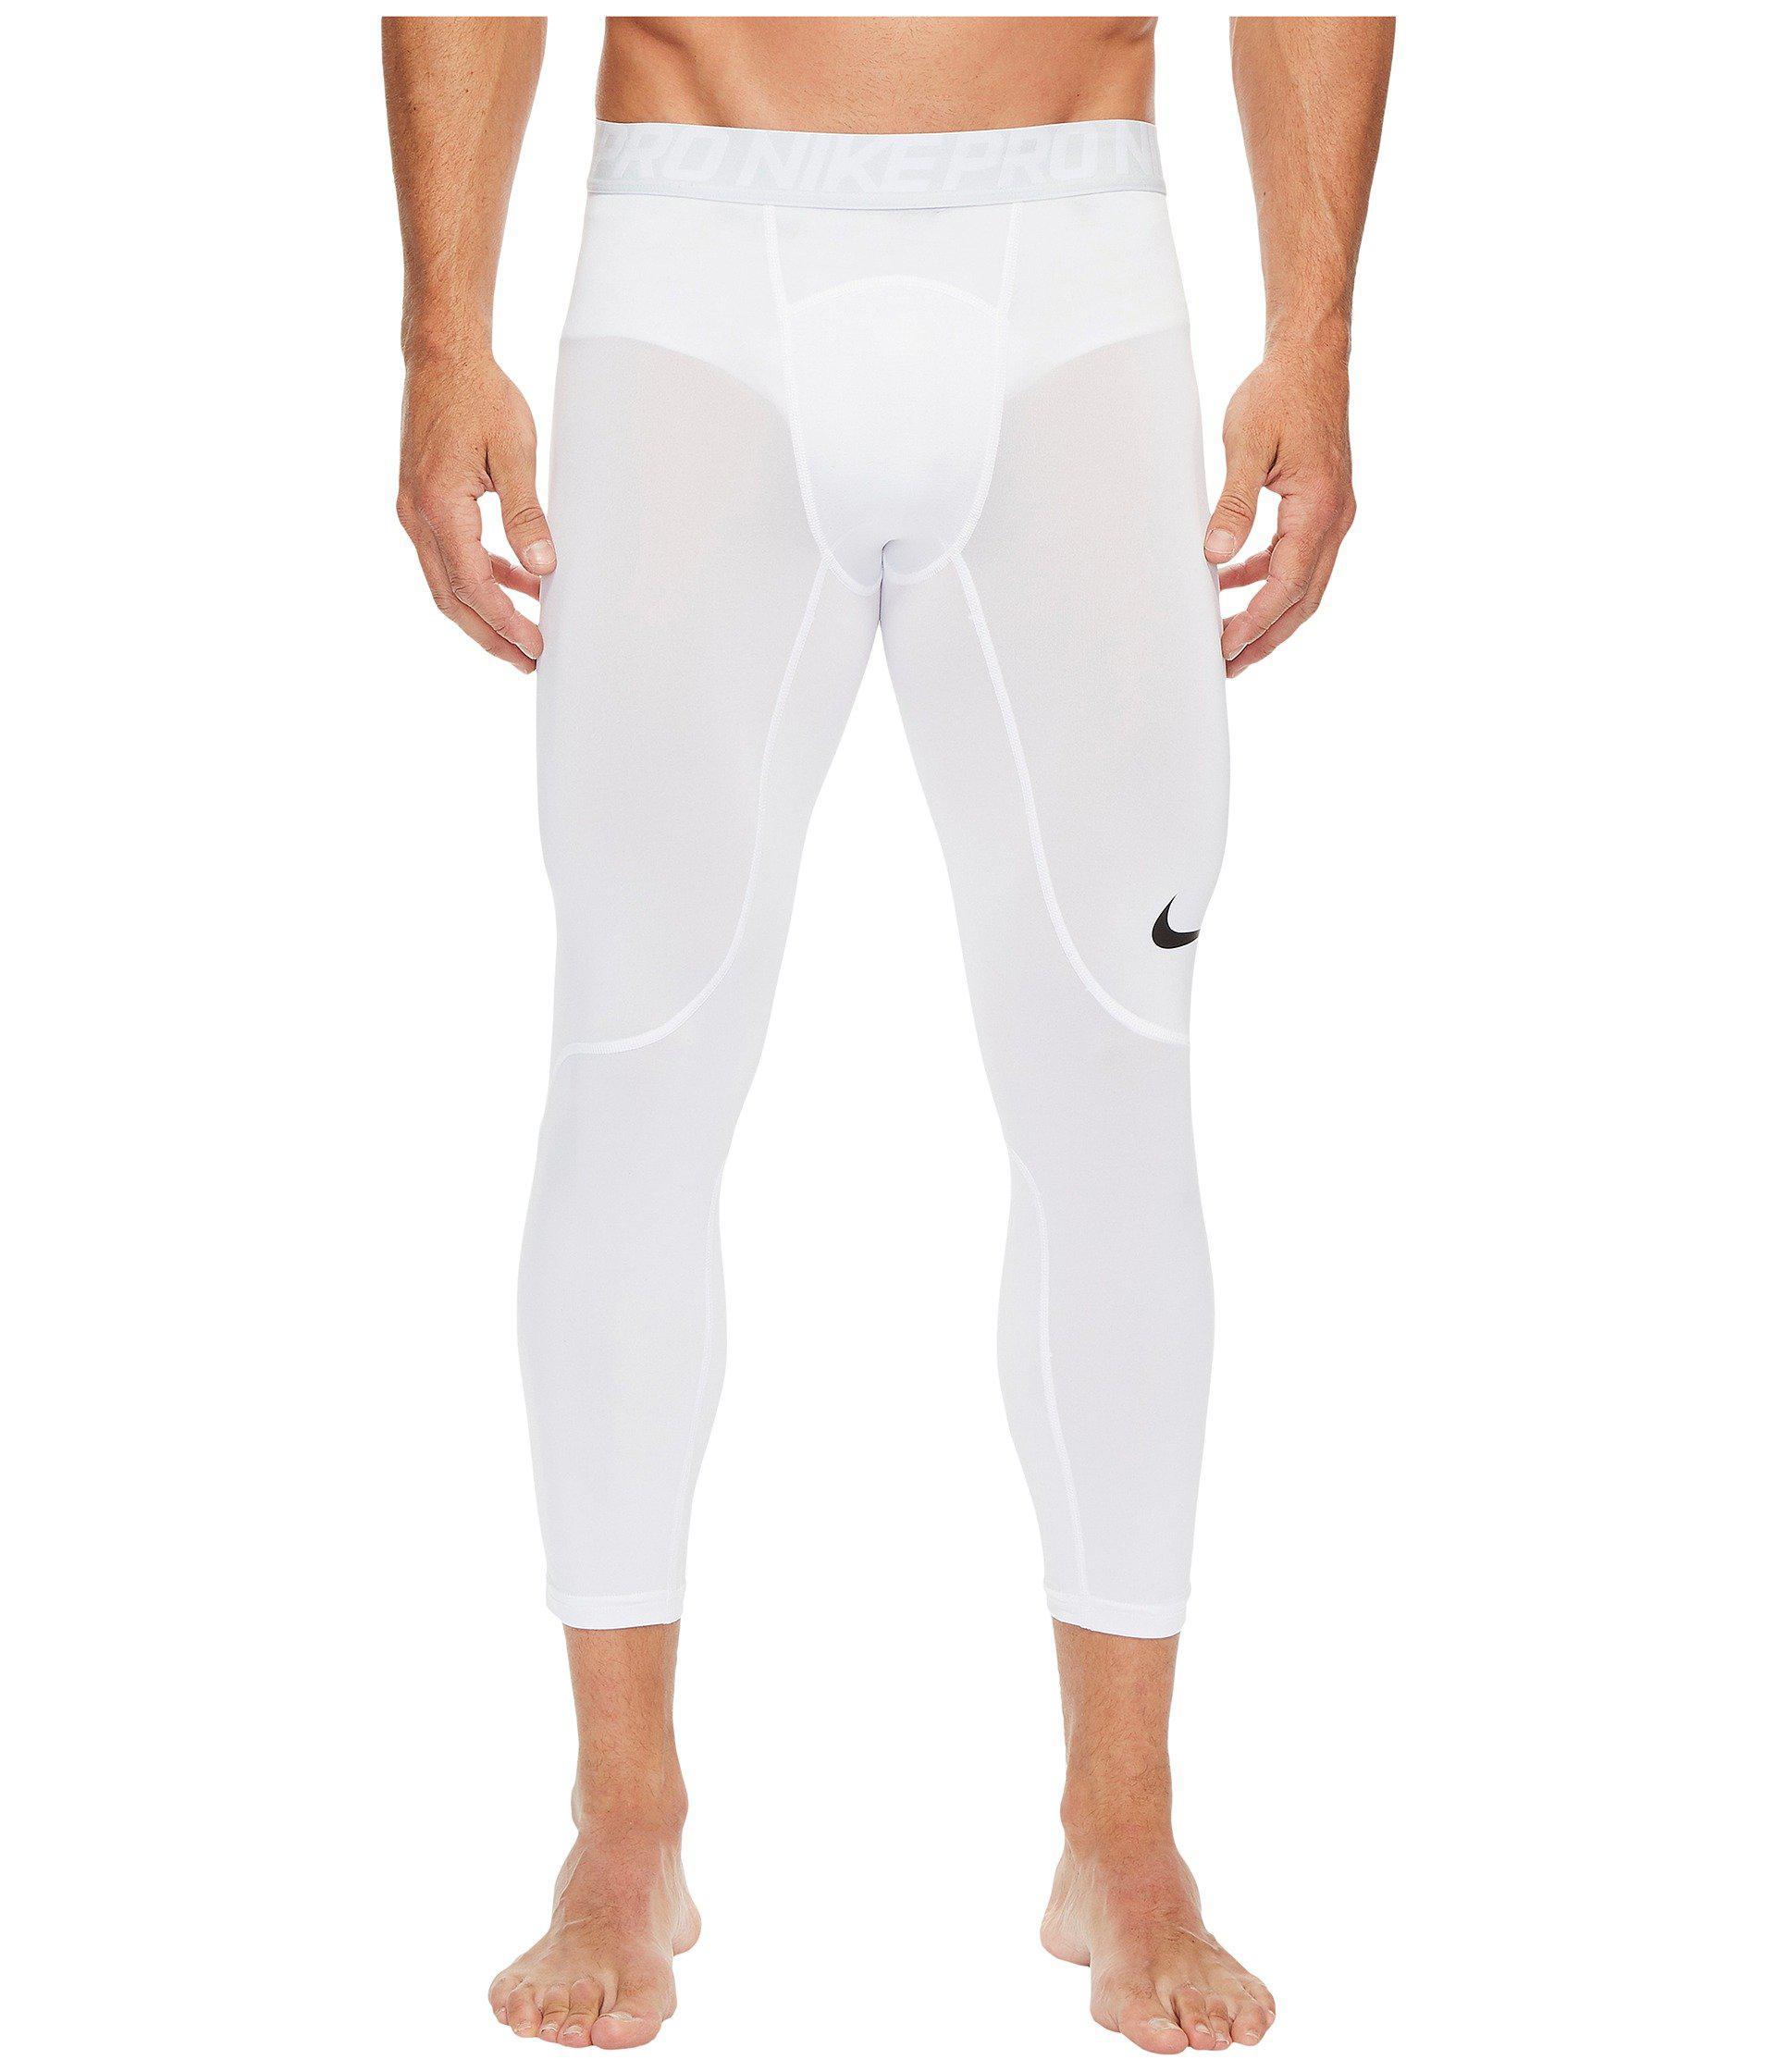 Lyst - Nike Pro Tight (carbon Heather dark Grey black) Men s Casual ... e810d6ed6